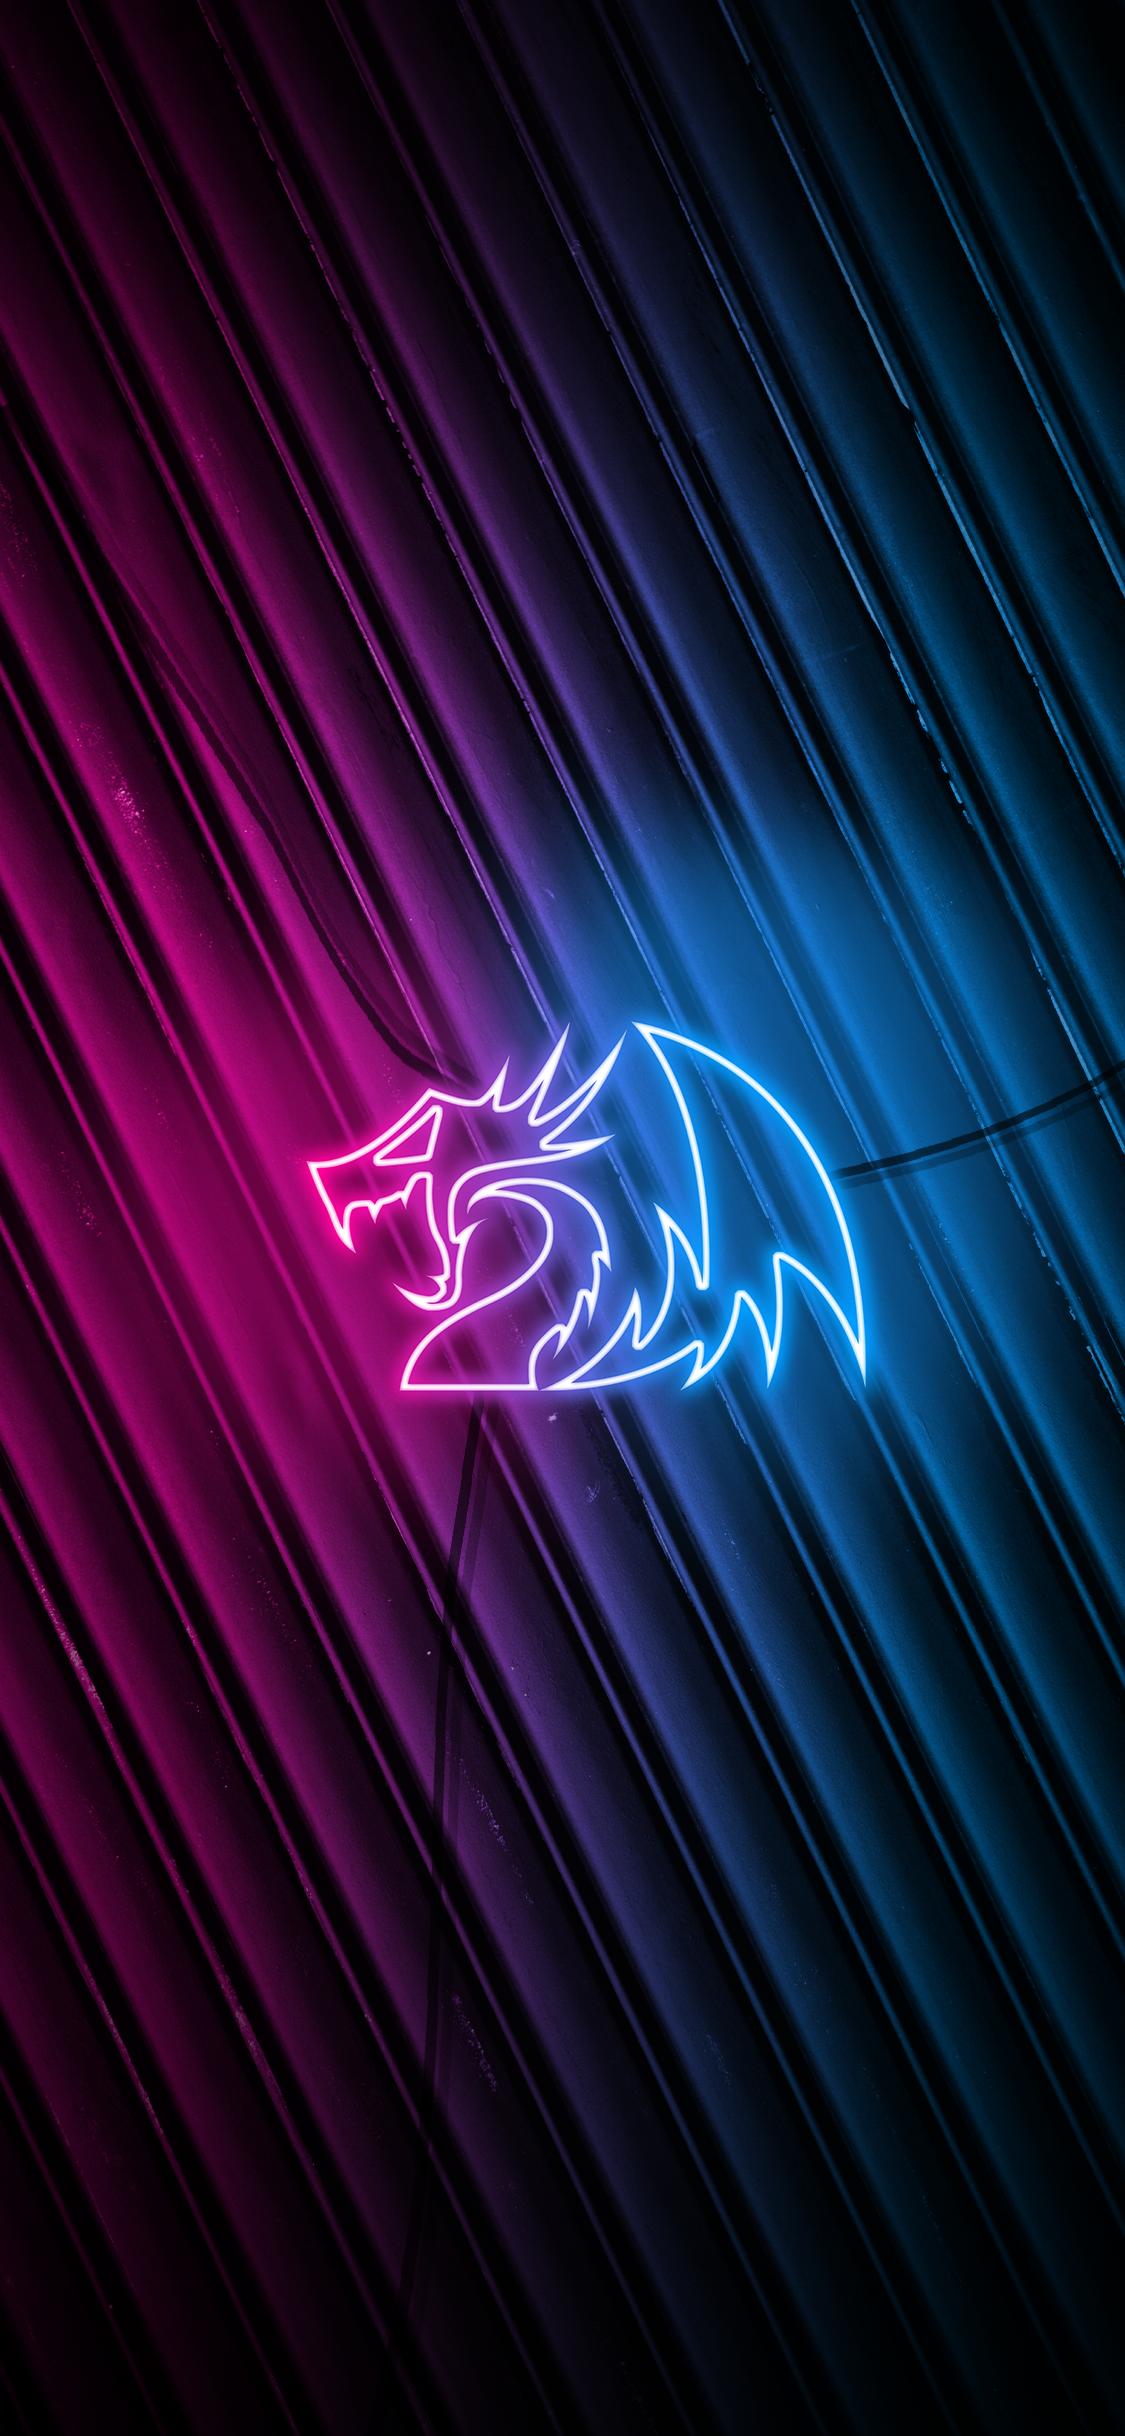 Redragon Neon Mobile